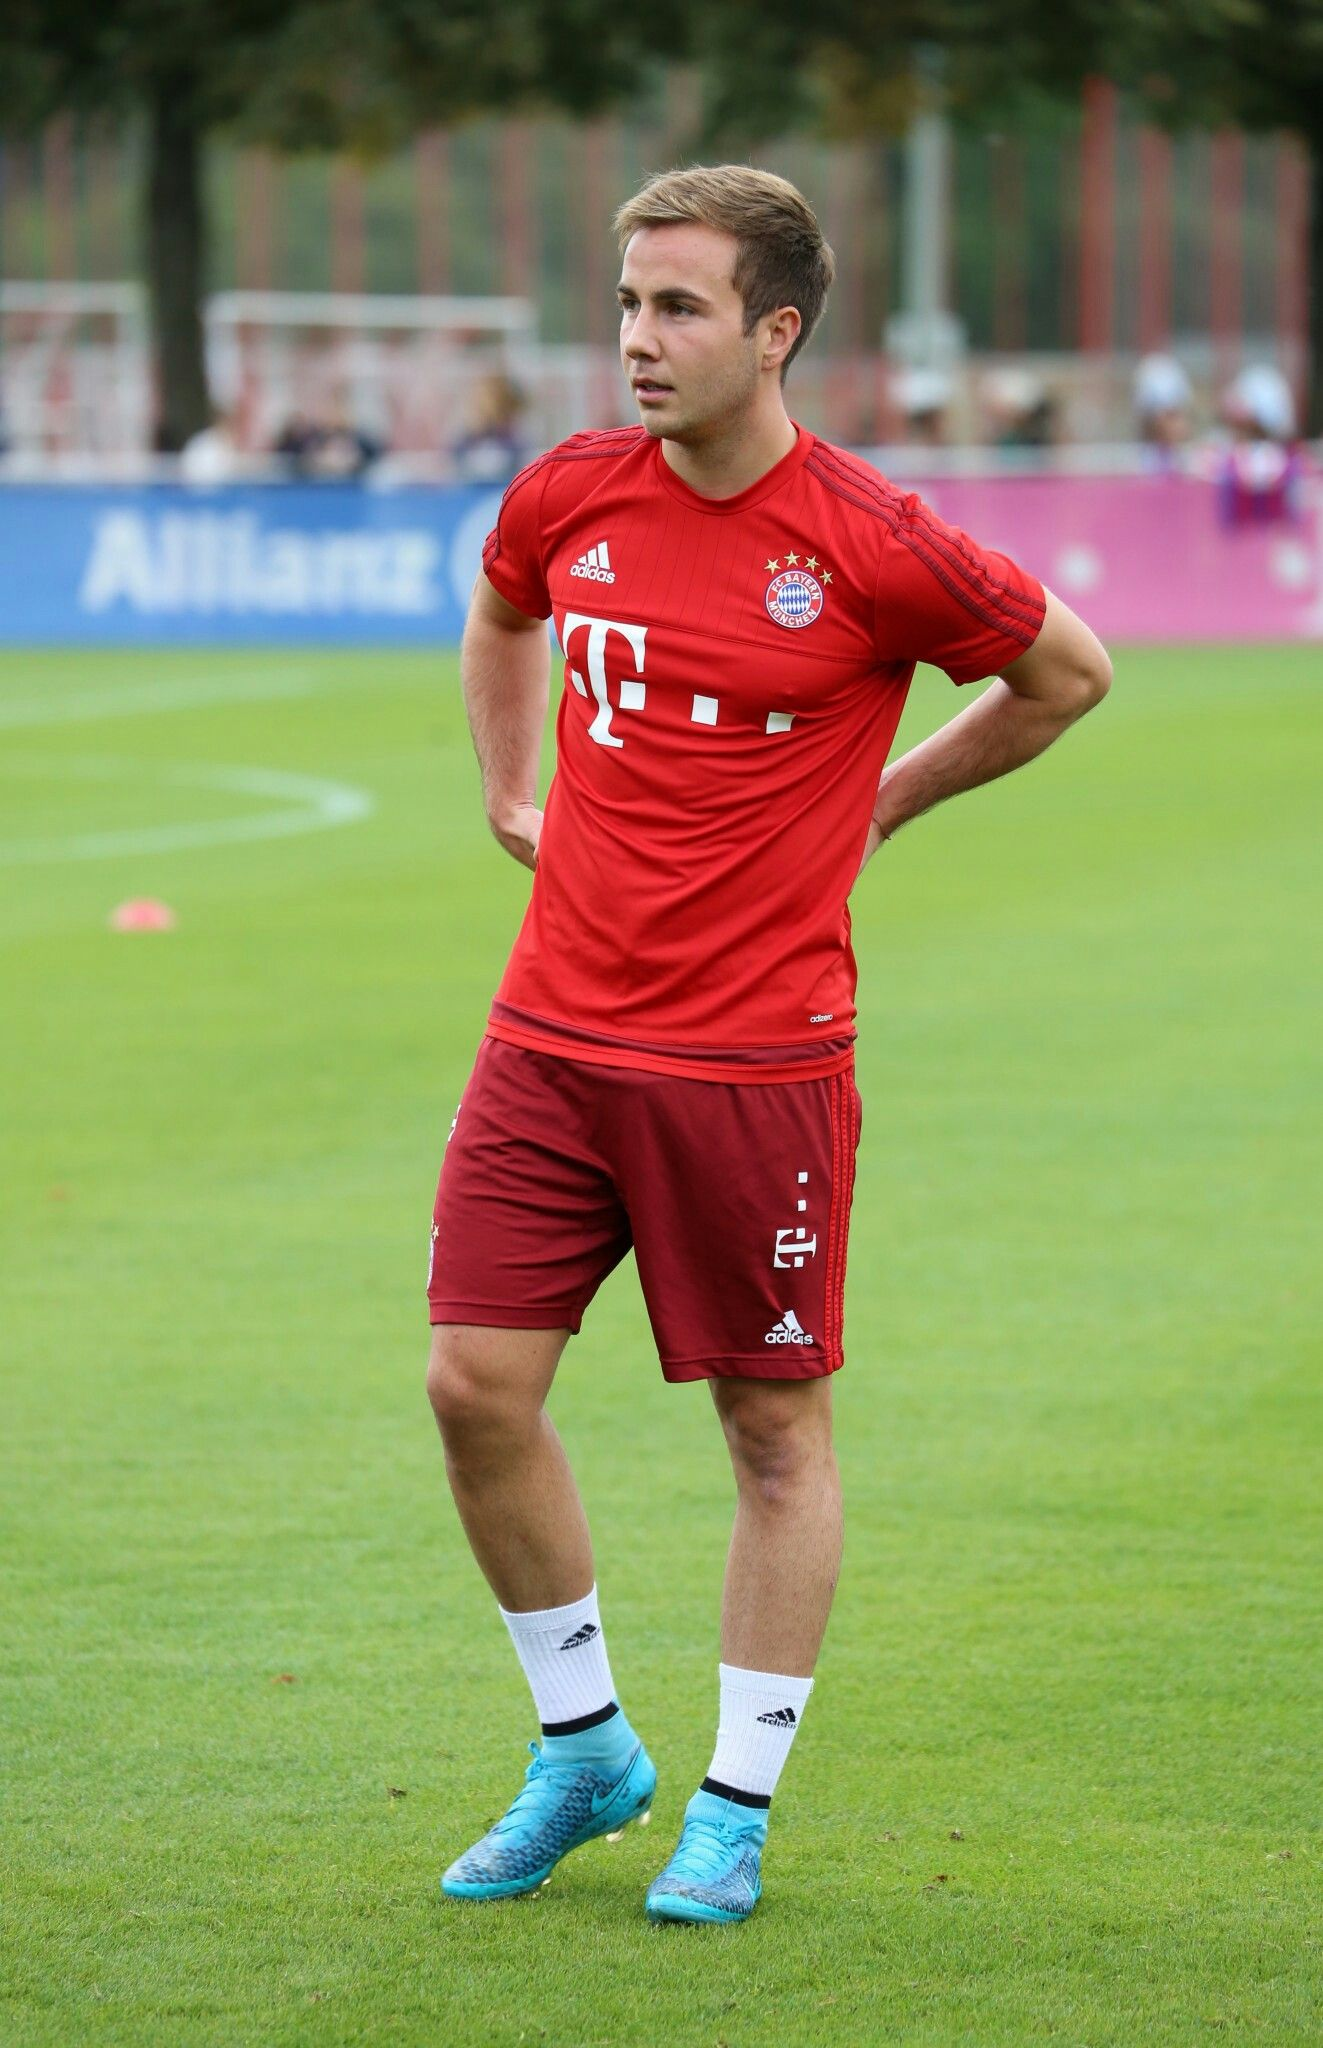 Mario Götze Germany national football team, National